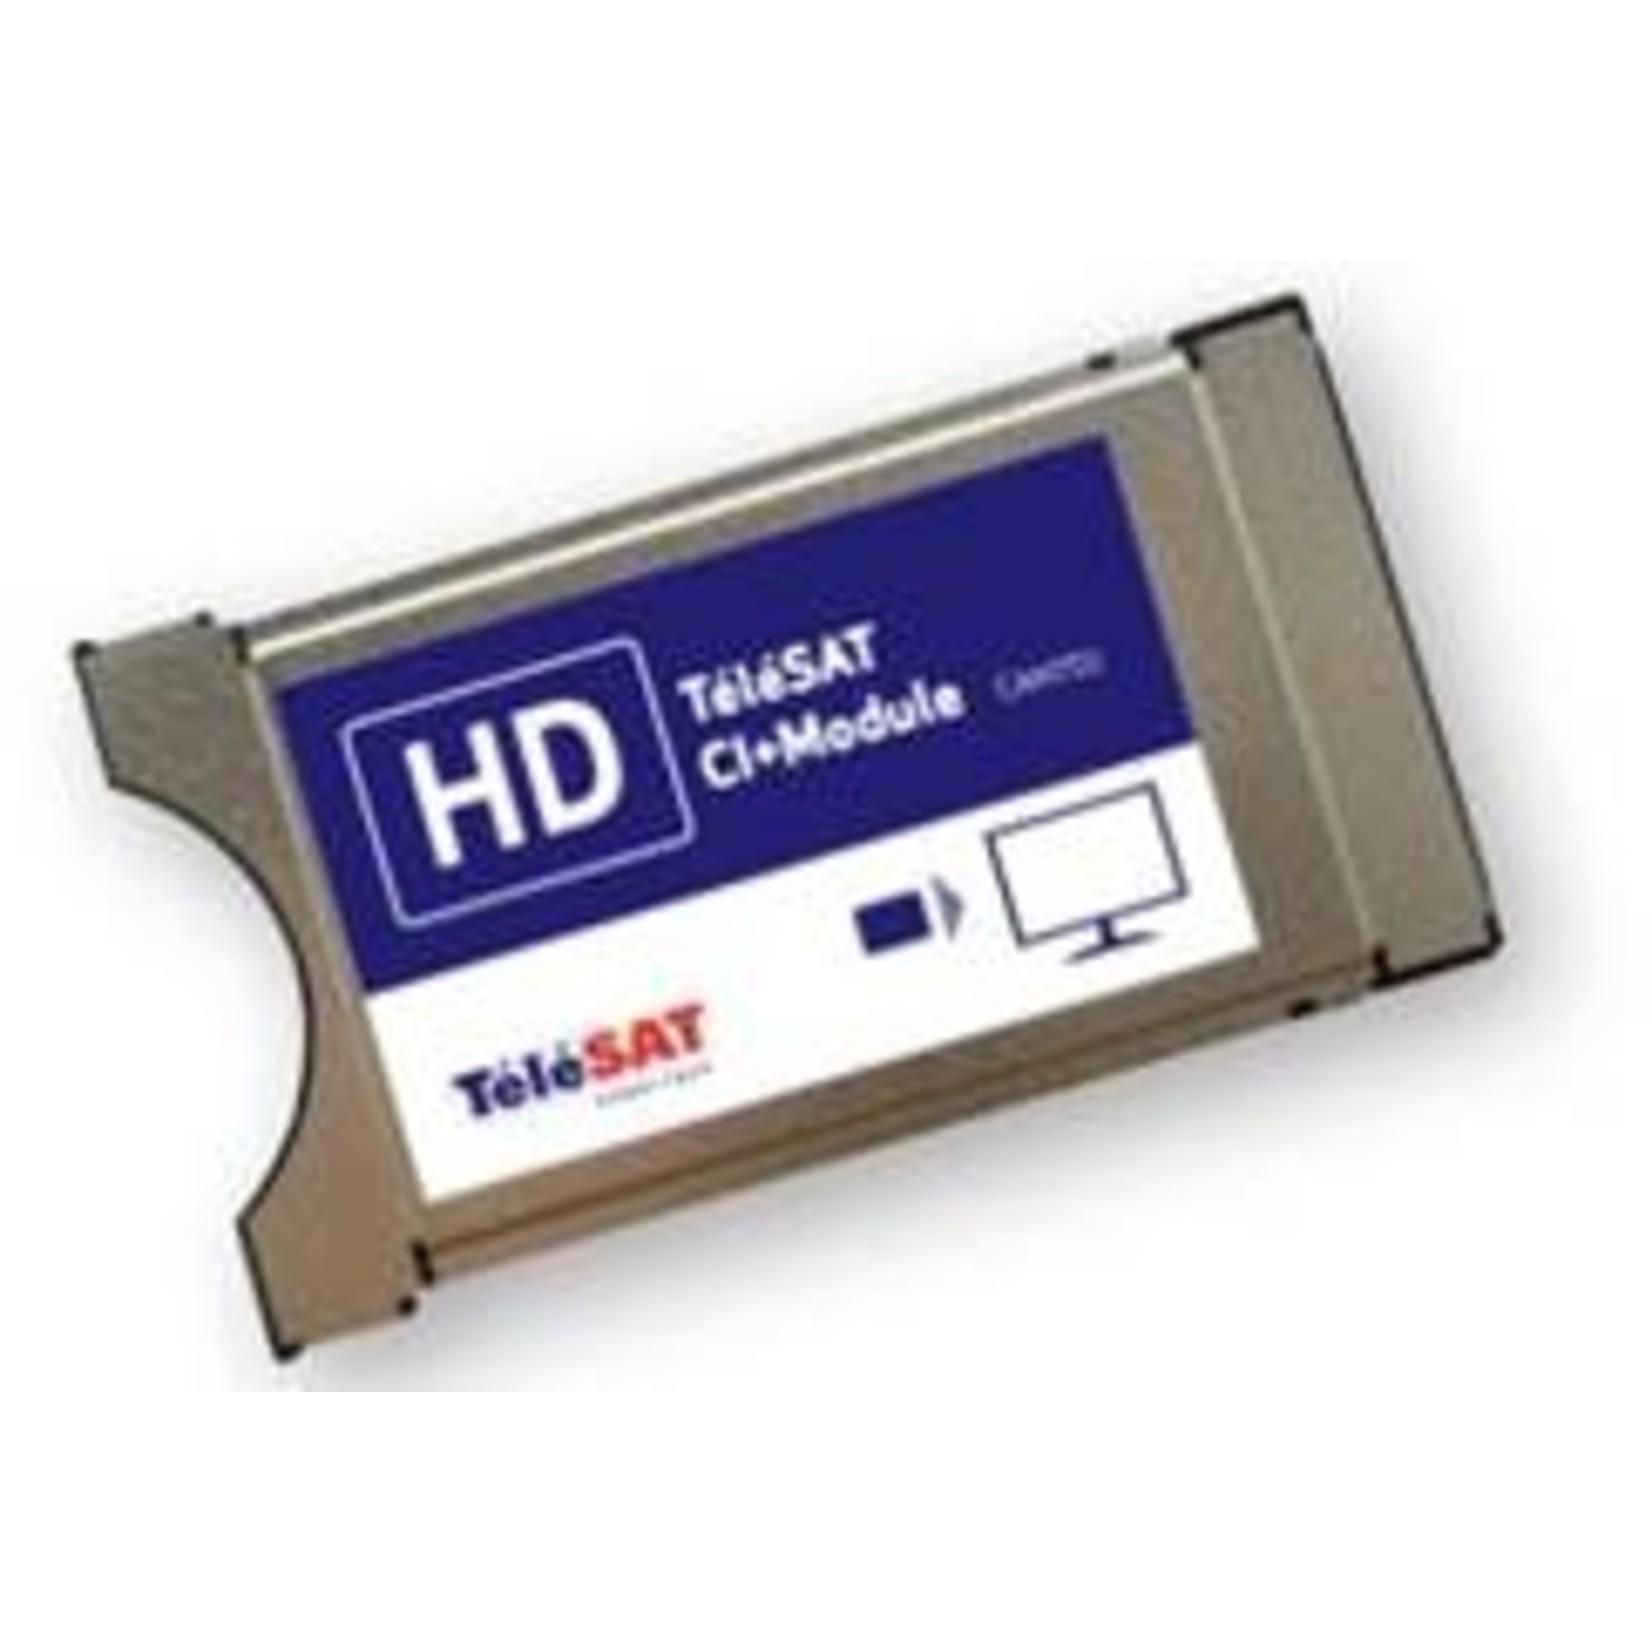 TELESAT TELESAT VIACCESS CI+ MODULE CAM 701 (viaccess)